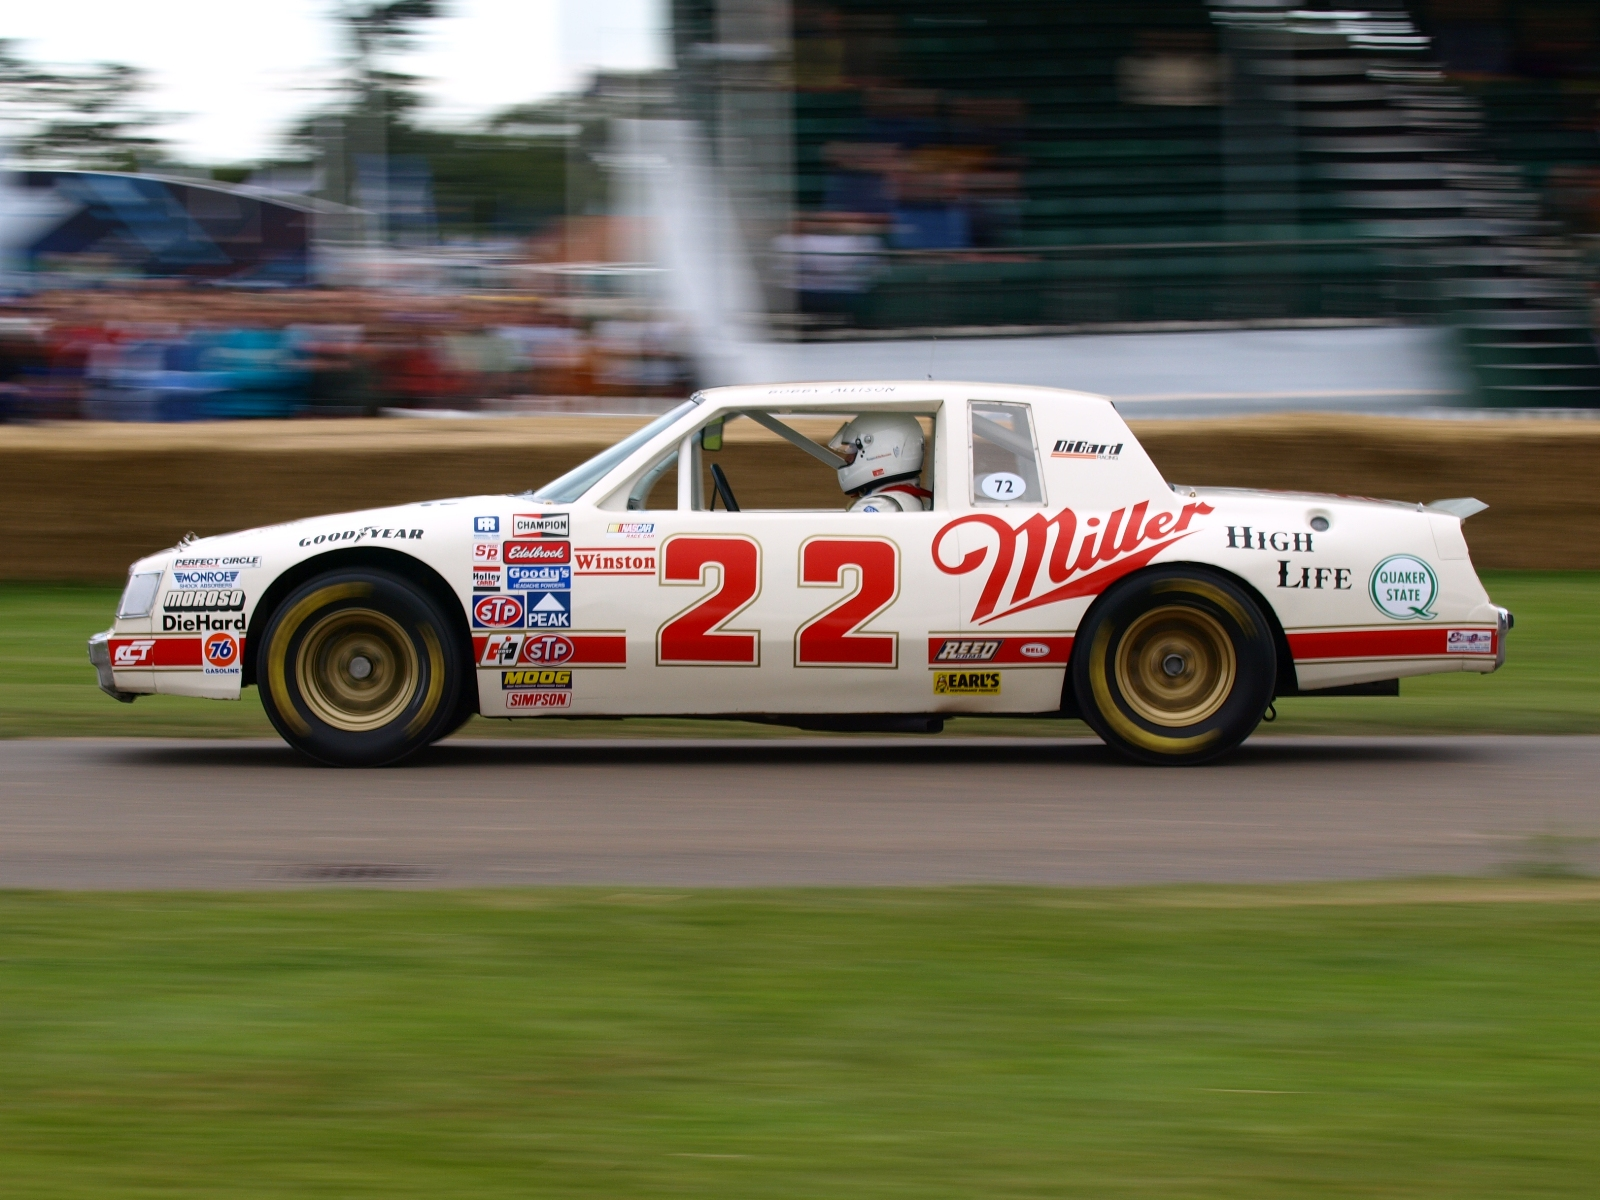 Car Wallpaper: :Bobby Allisons 1983 championship NASCAR car.jpg ...